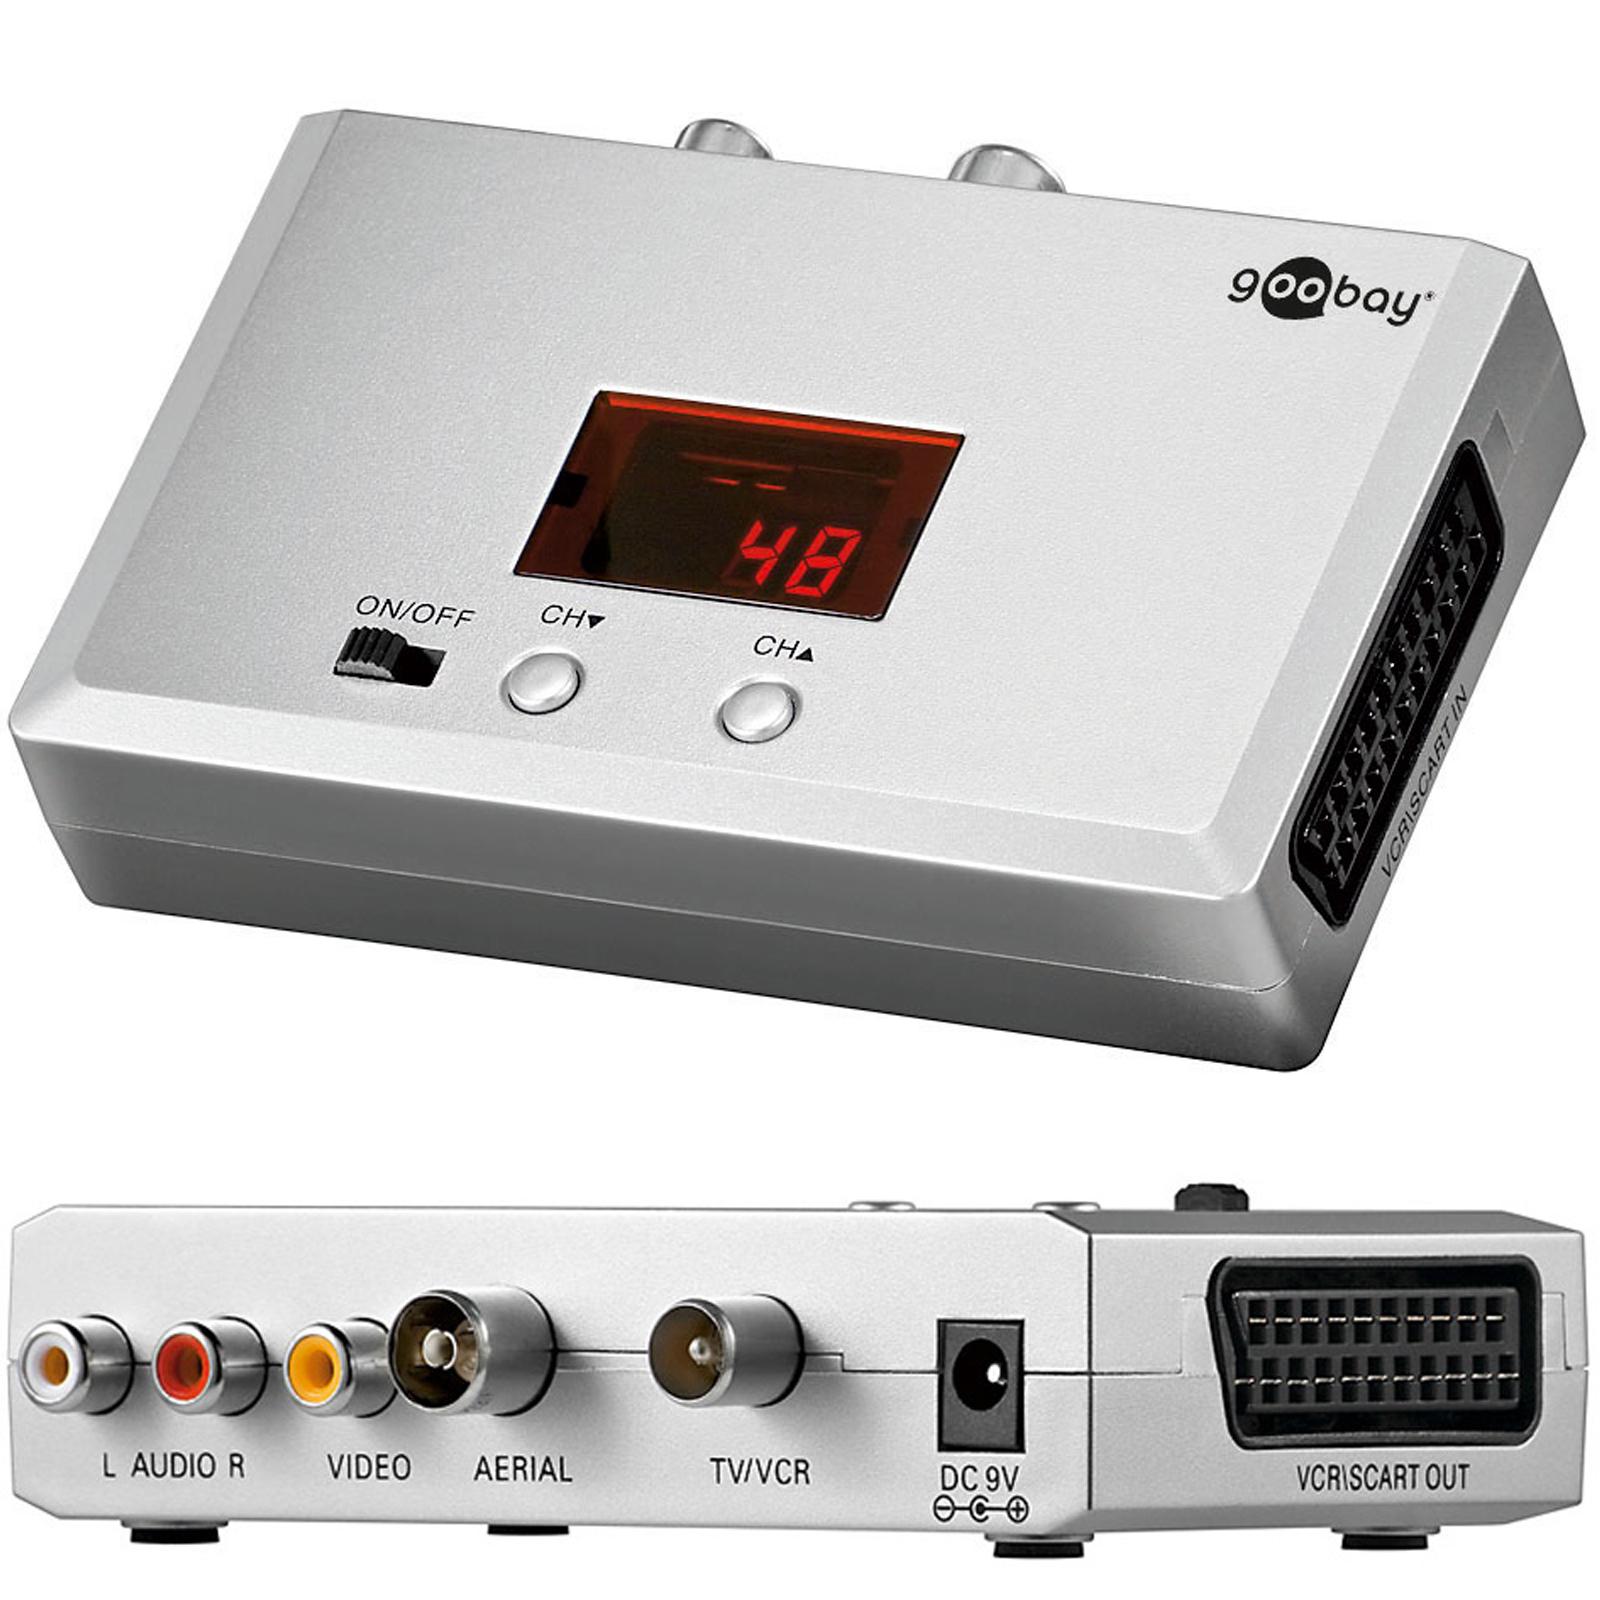 breitband audio video hf modulator scart cinch auf antenne konverter uhf vhf. Black Bedroom Furniture Sets. Home Design Ideas